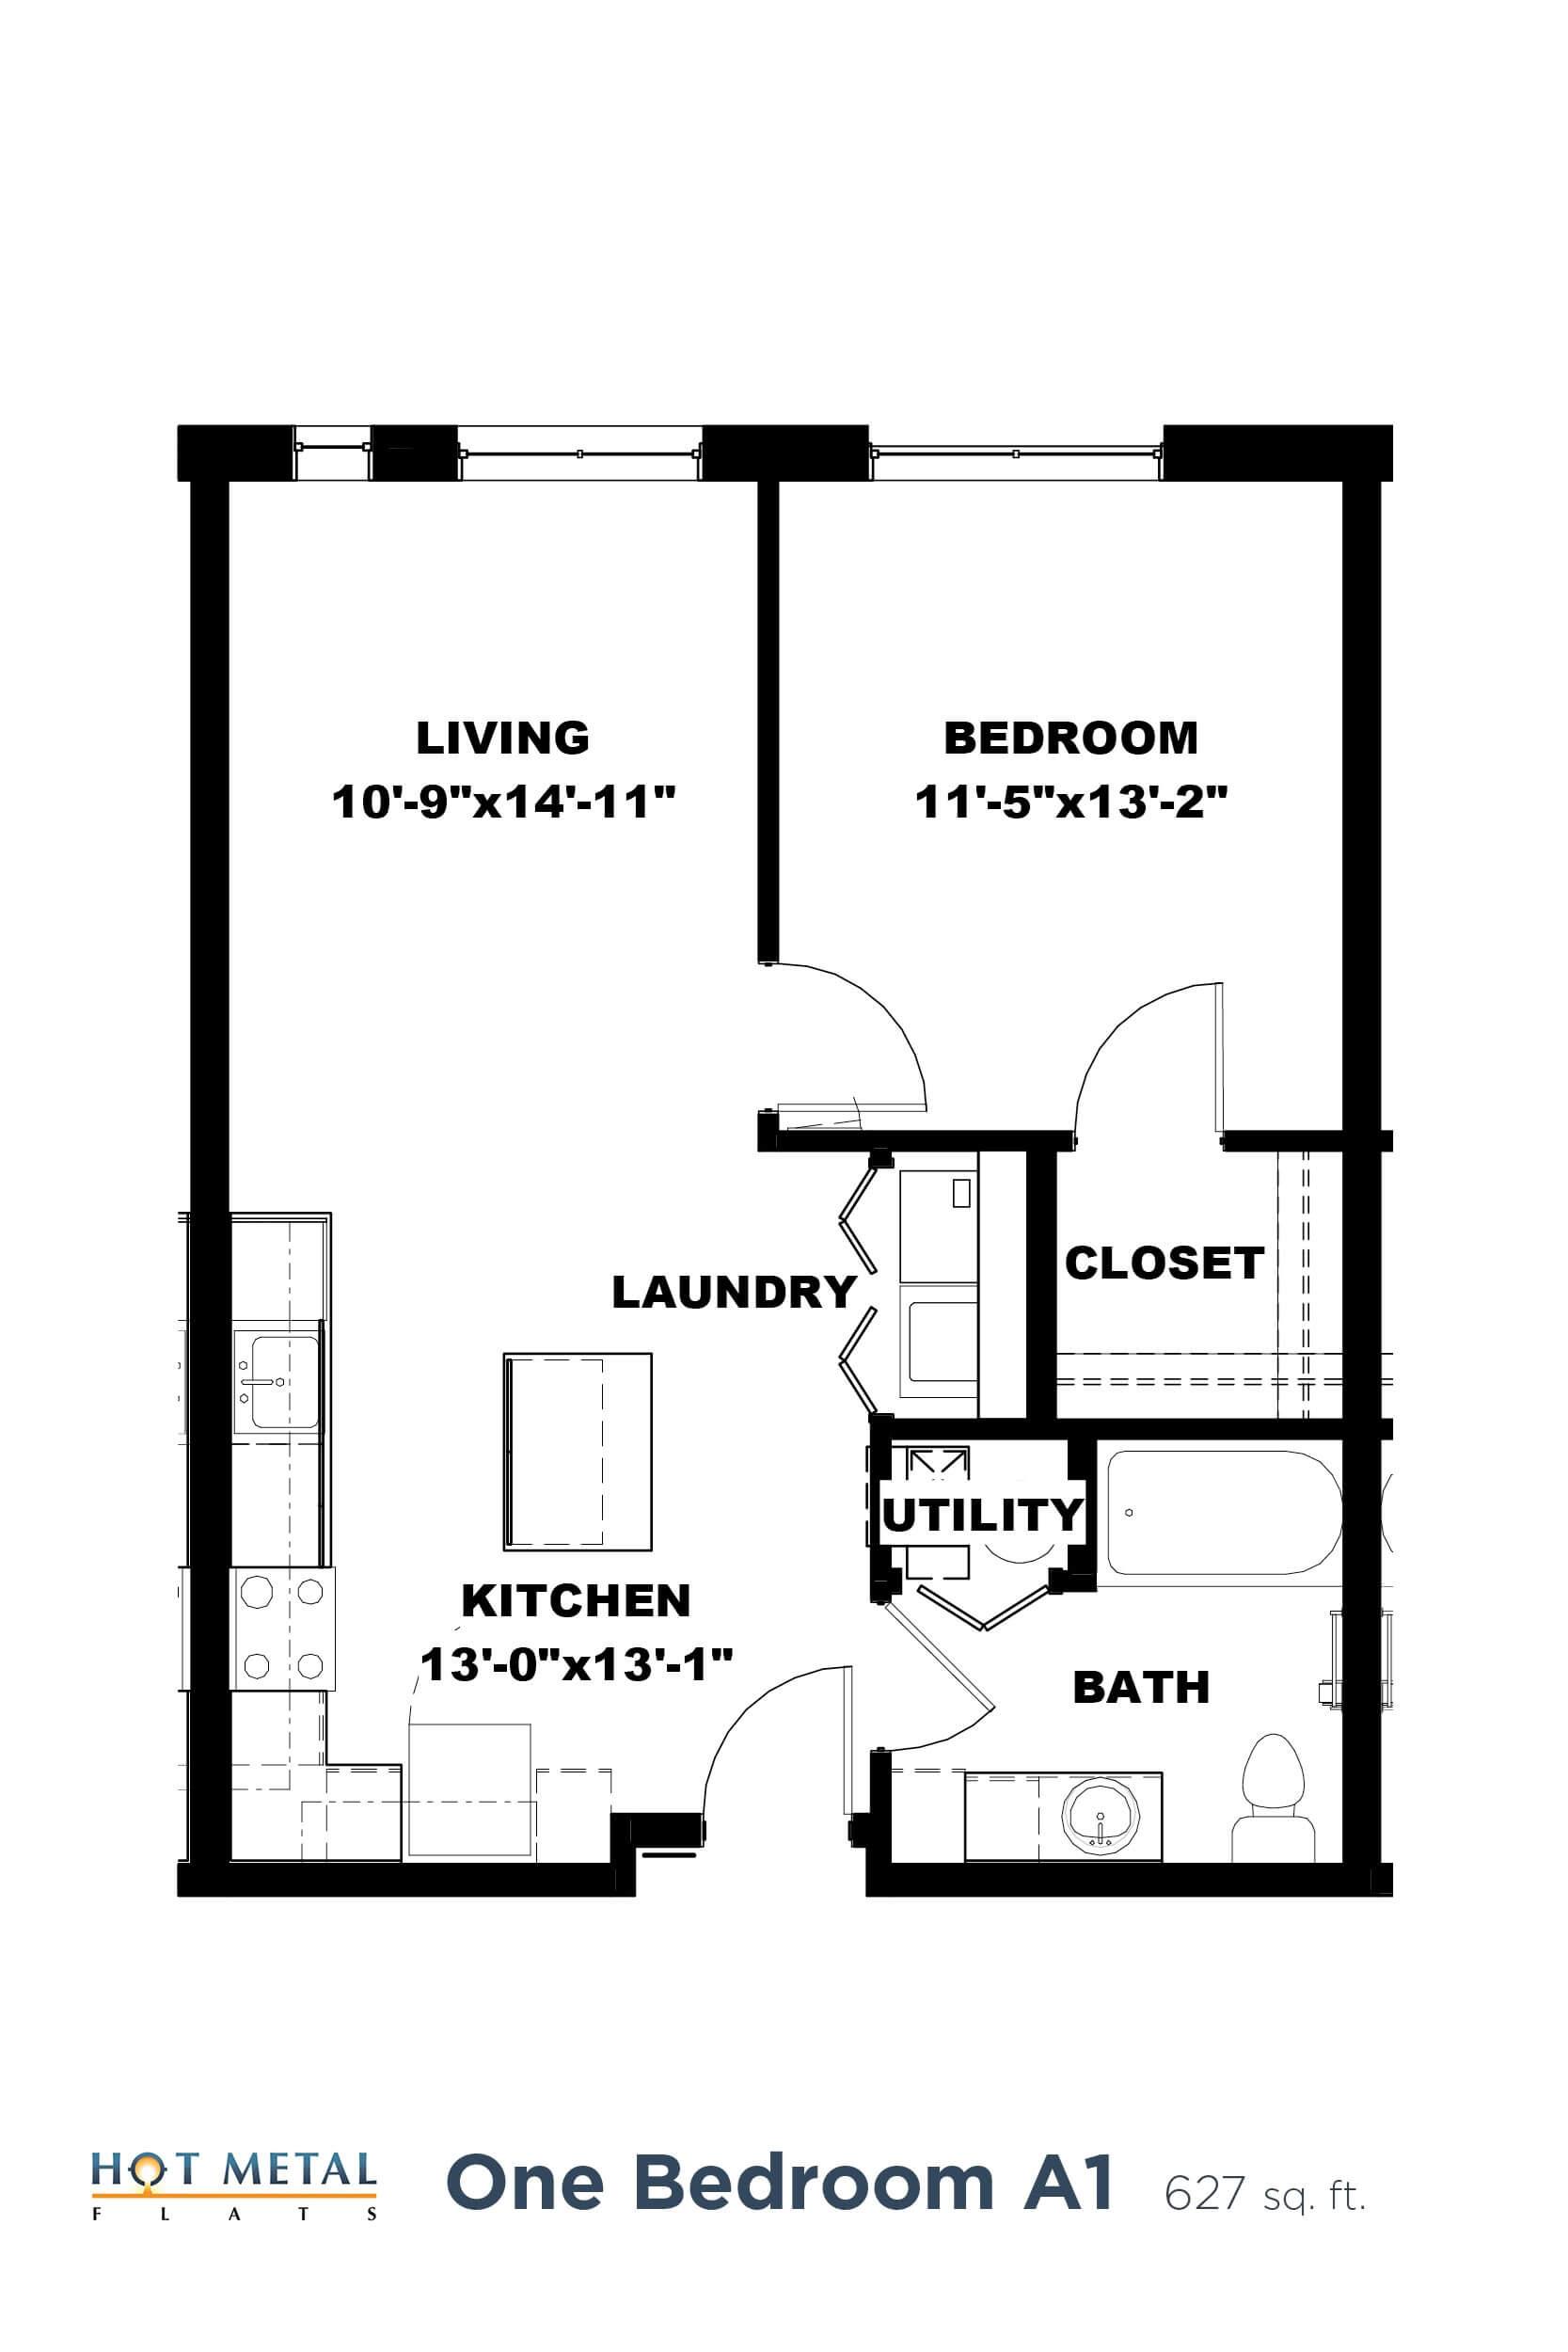 Floor Plan  Hot Metal Flats A1 floorplan, Hot Metal Flats apartments, Pittsburgh, PA, opens a dialog